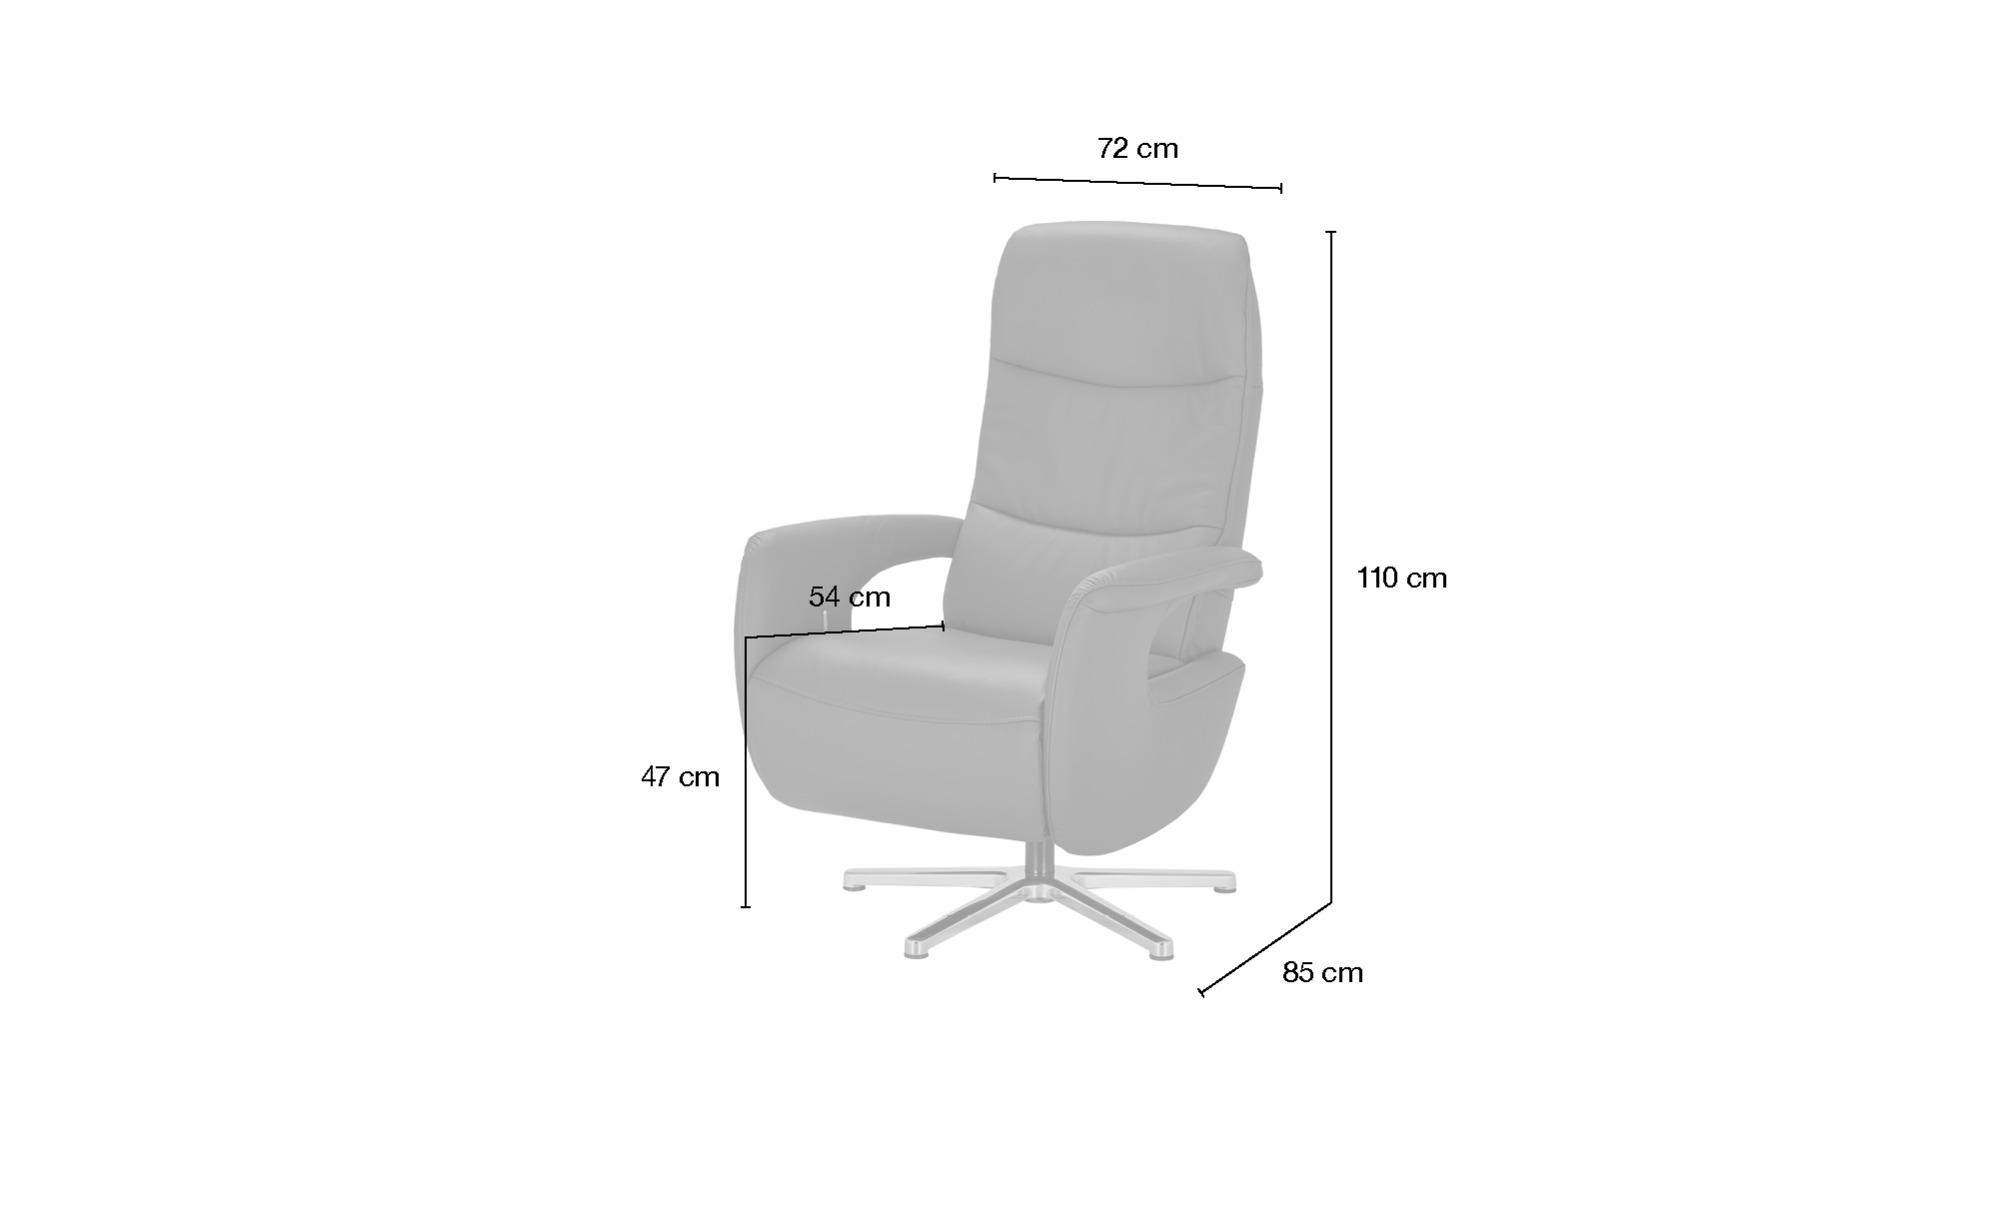 Hukla Relaxsessel  Enno ¦ rot ¦ Maße (cm): B: 72 H: 110 T: 85 Polstermöbel > Sessel > Fernsehsessel - Höffner